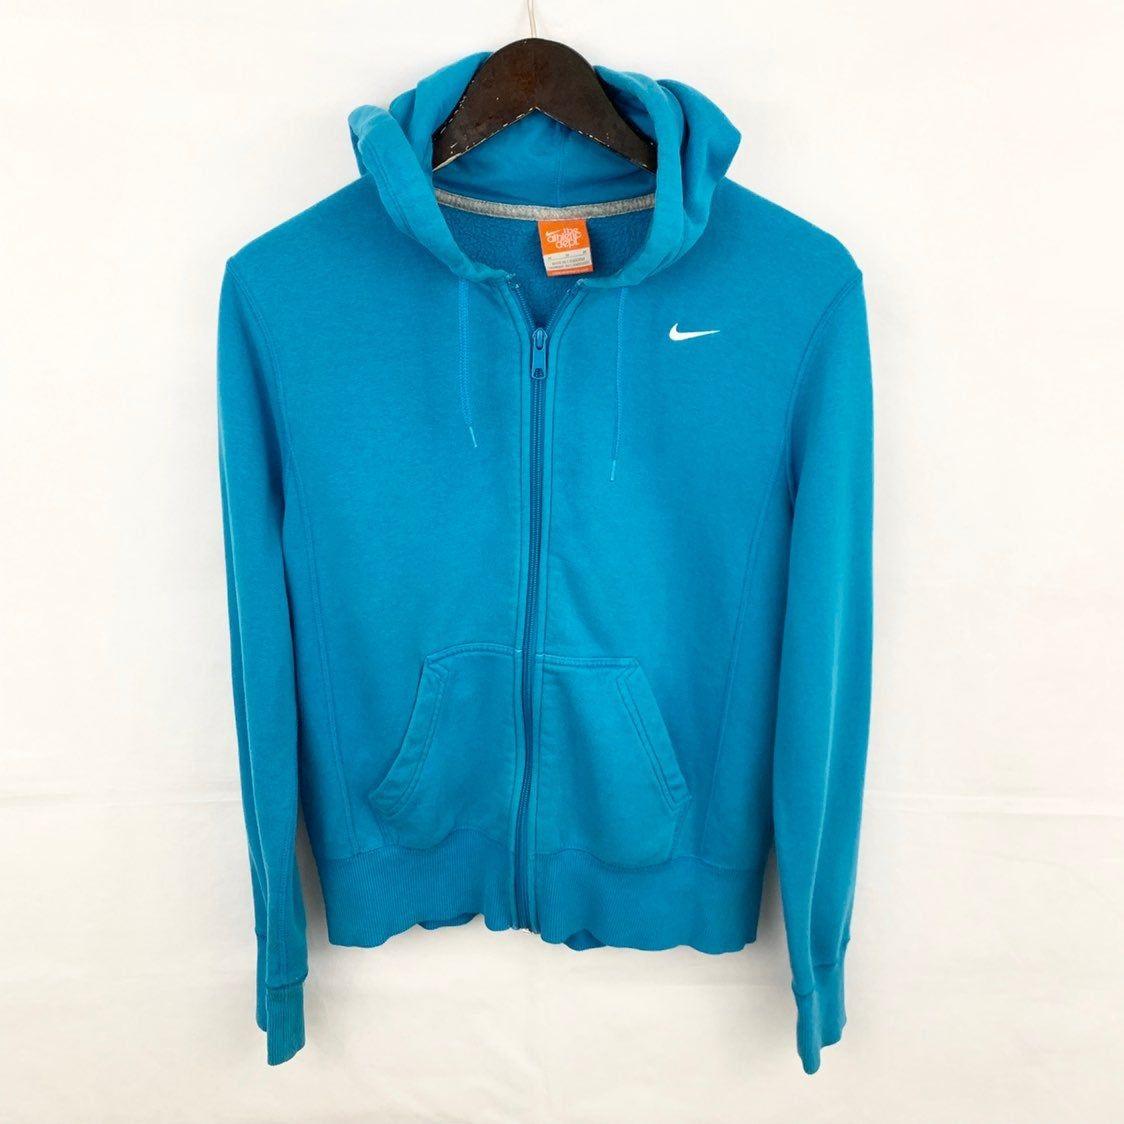 Excellent Condition Nike Women S Teal Blue Full Zip Hooded Jacket Features Zippered Hoodie Drawstrings 2 Front Pockets Nik Nike Women Hoodies Blue Hoodie [ 1124 x 1124 Pixel ]